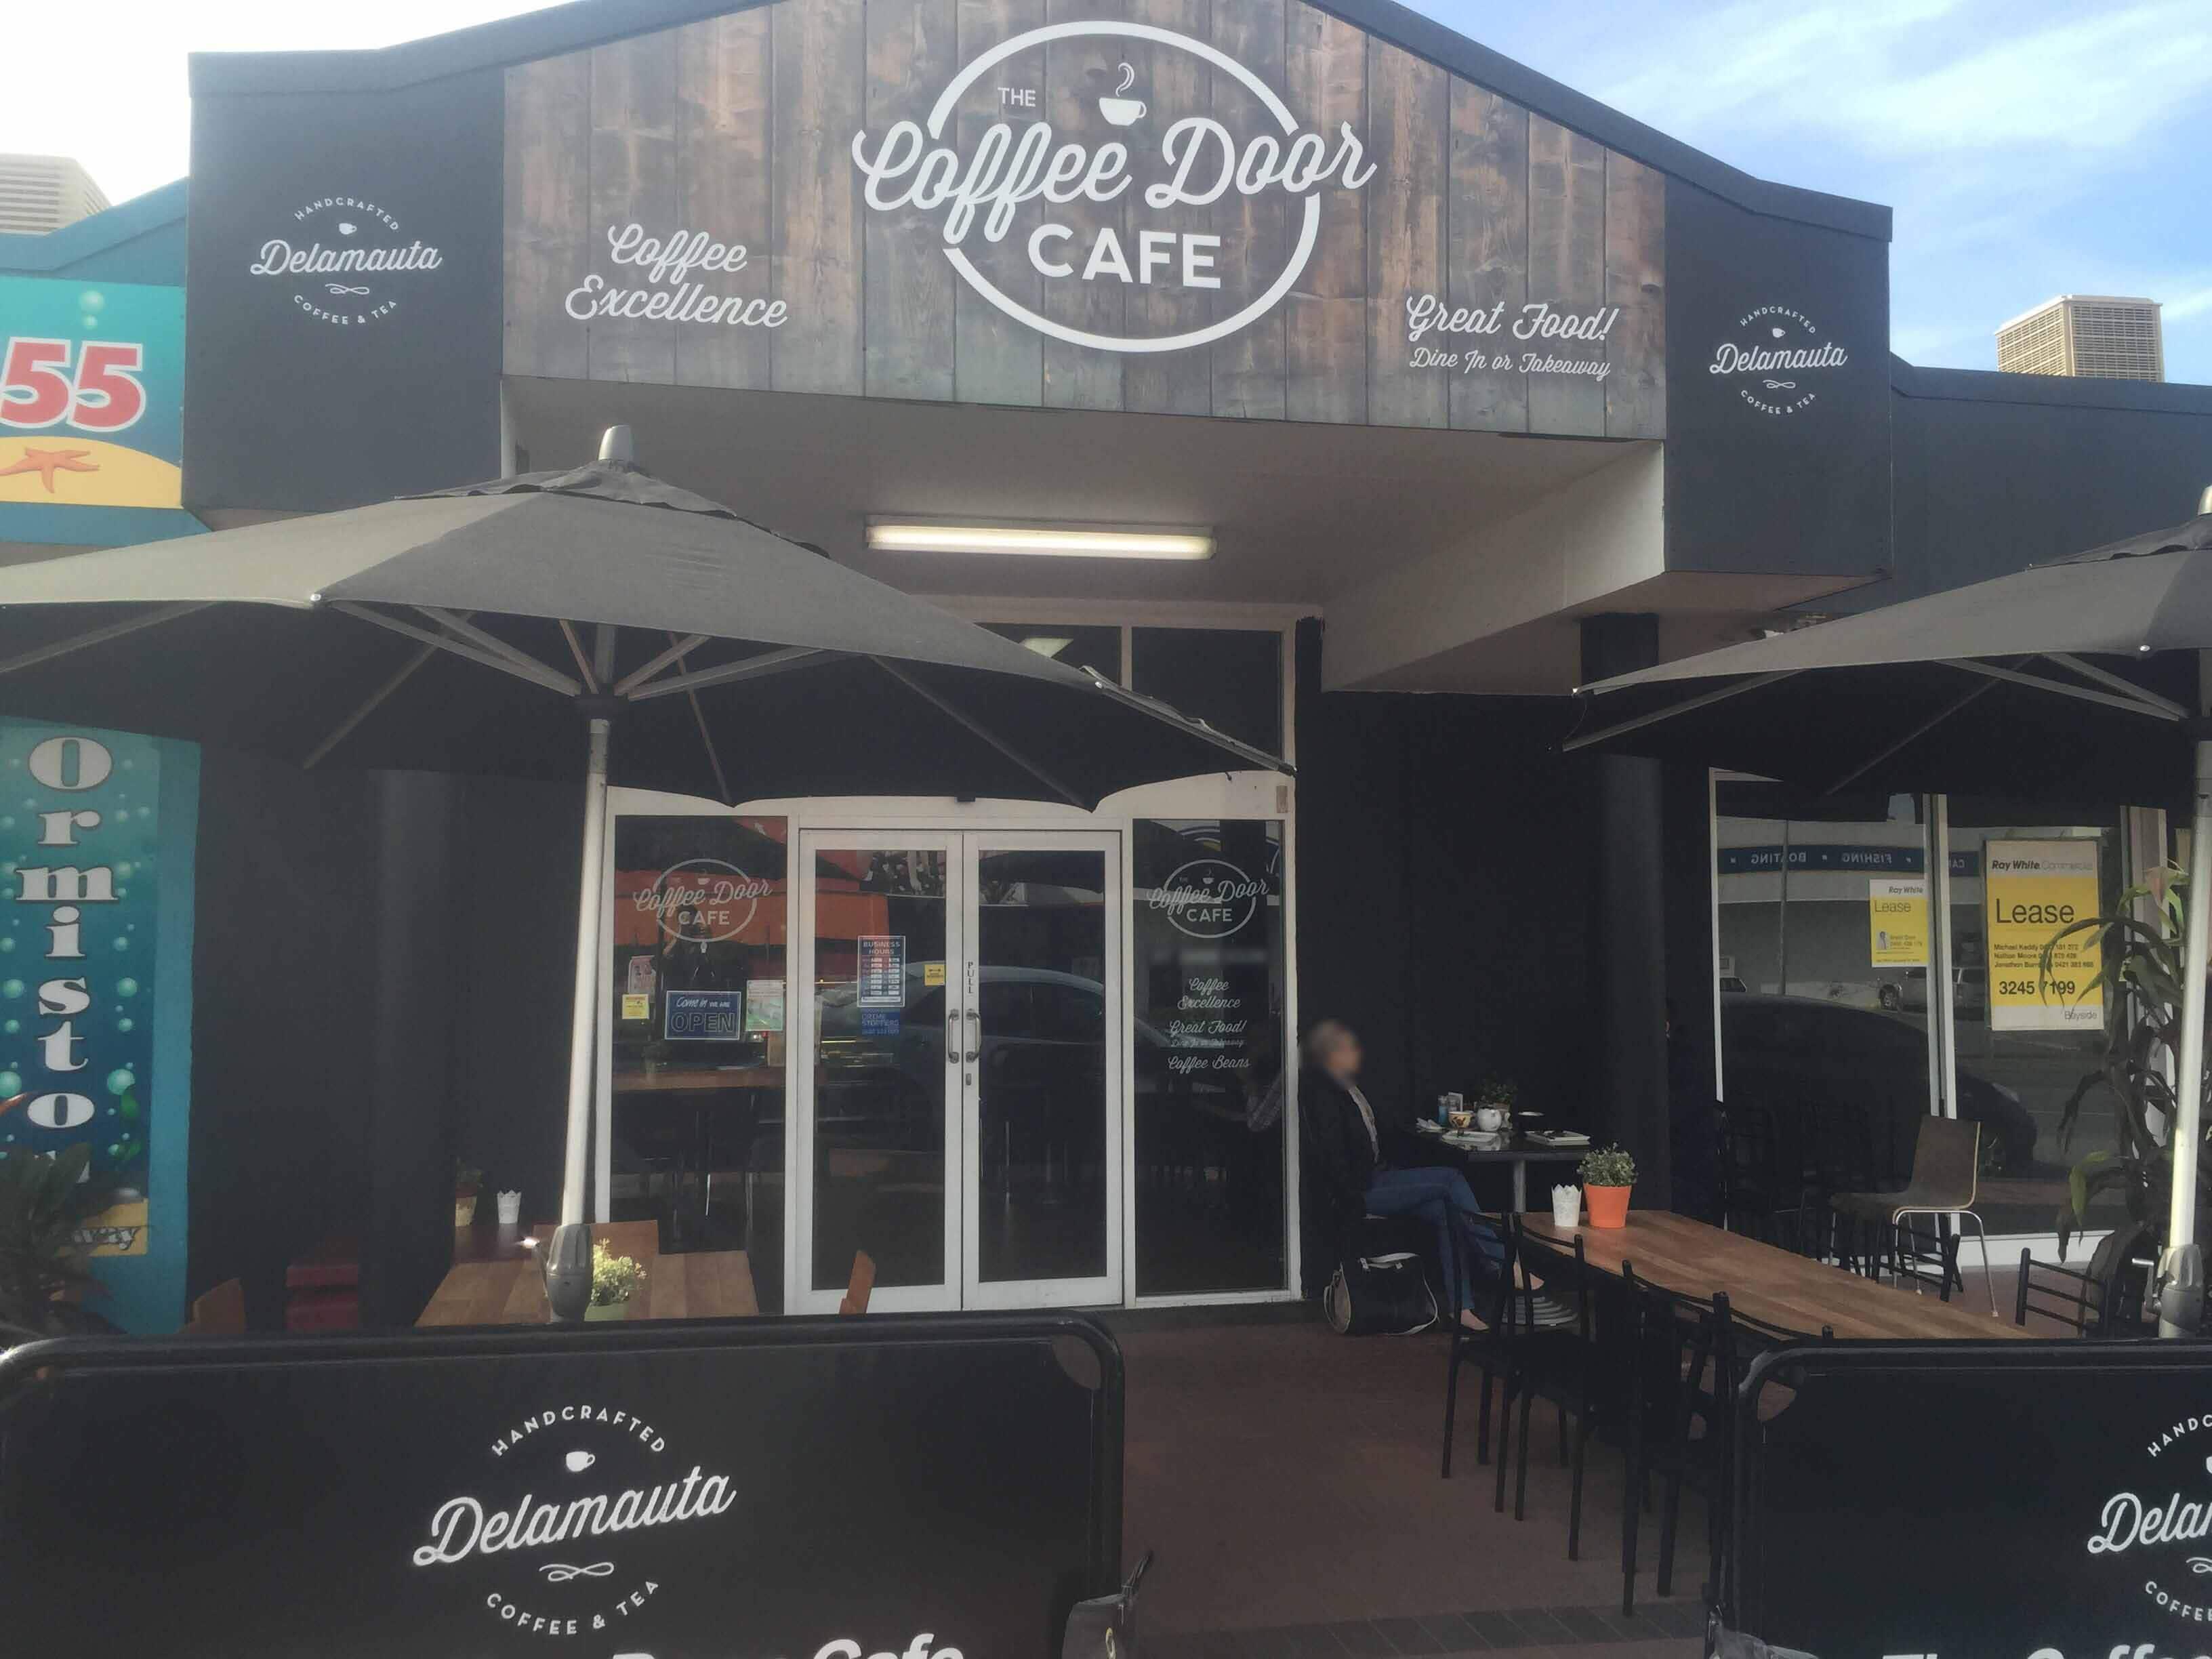 The Coffee Door Cafe Cleveland Photos & The Coffee Door Cafe Ormiston Brisbane - Urbanspoon/Zomato